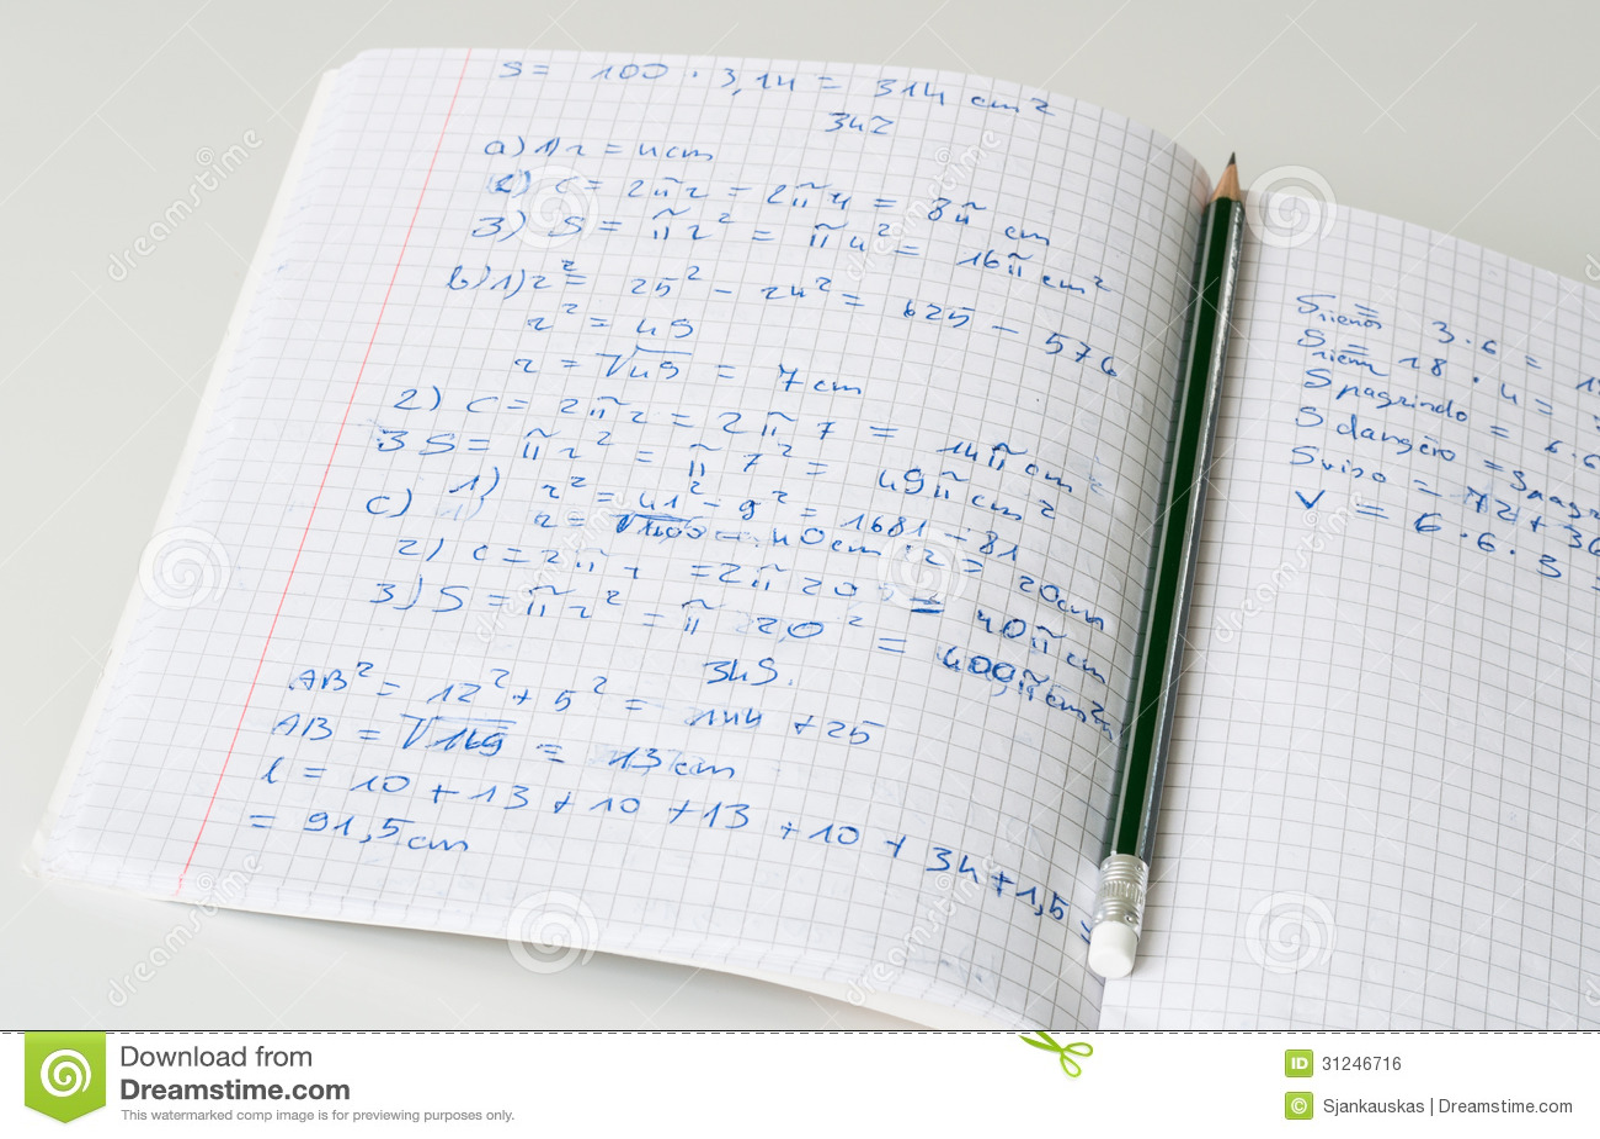 How to Write a Math Book